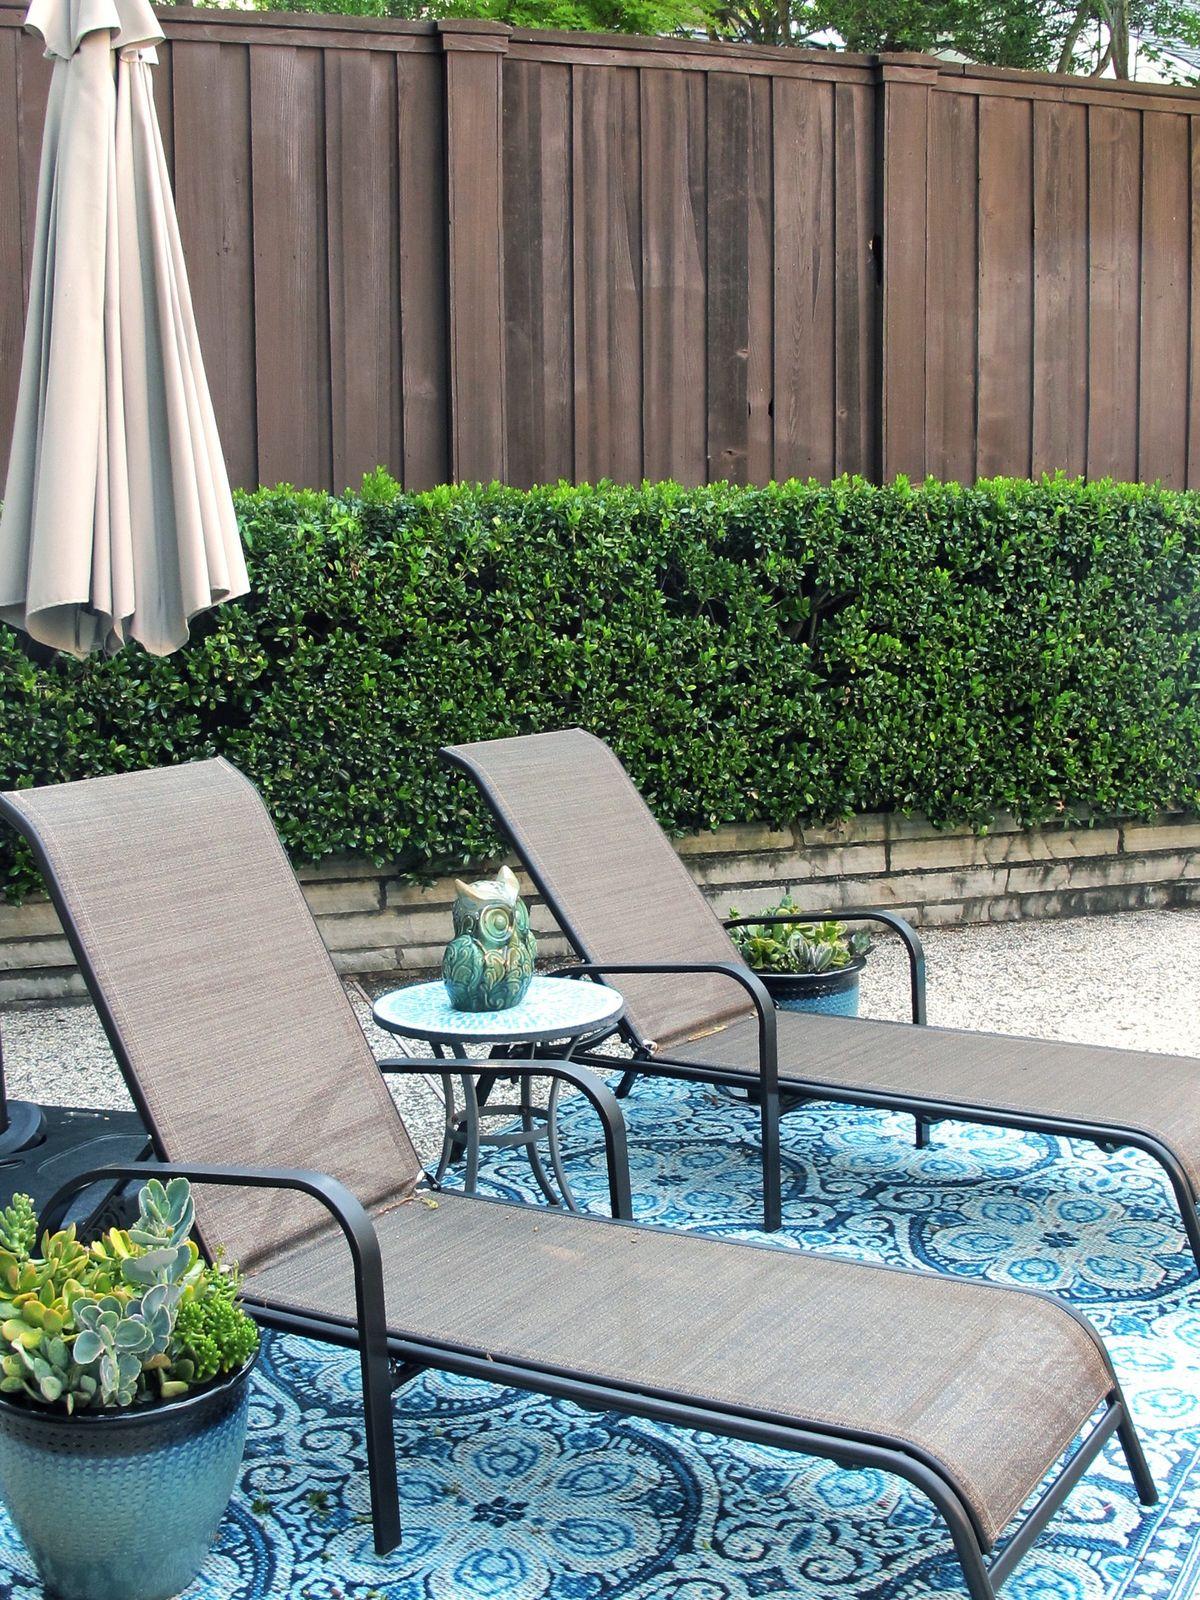 Kirkpatrick Contemporary Home Photo Video Shoot Location Dallas 27.jpg